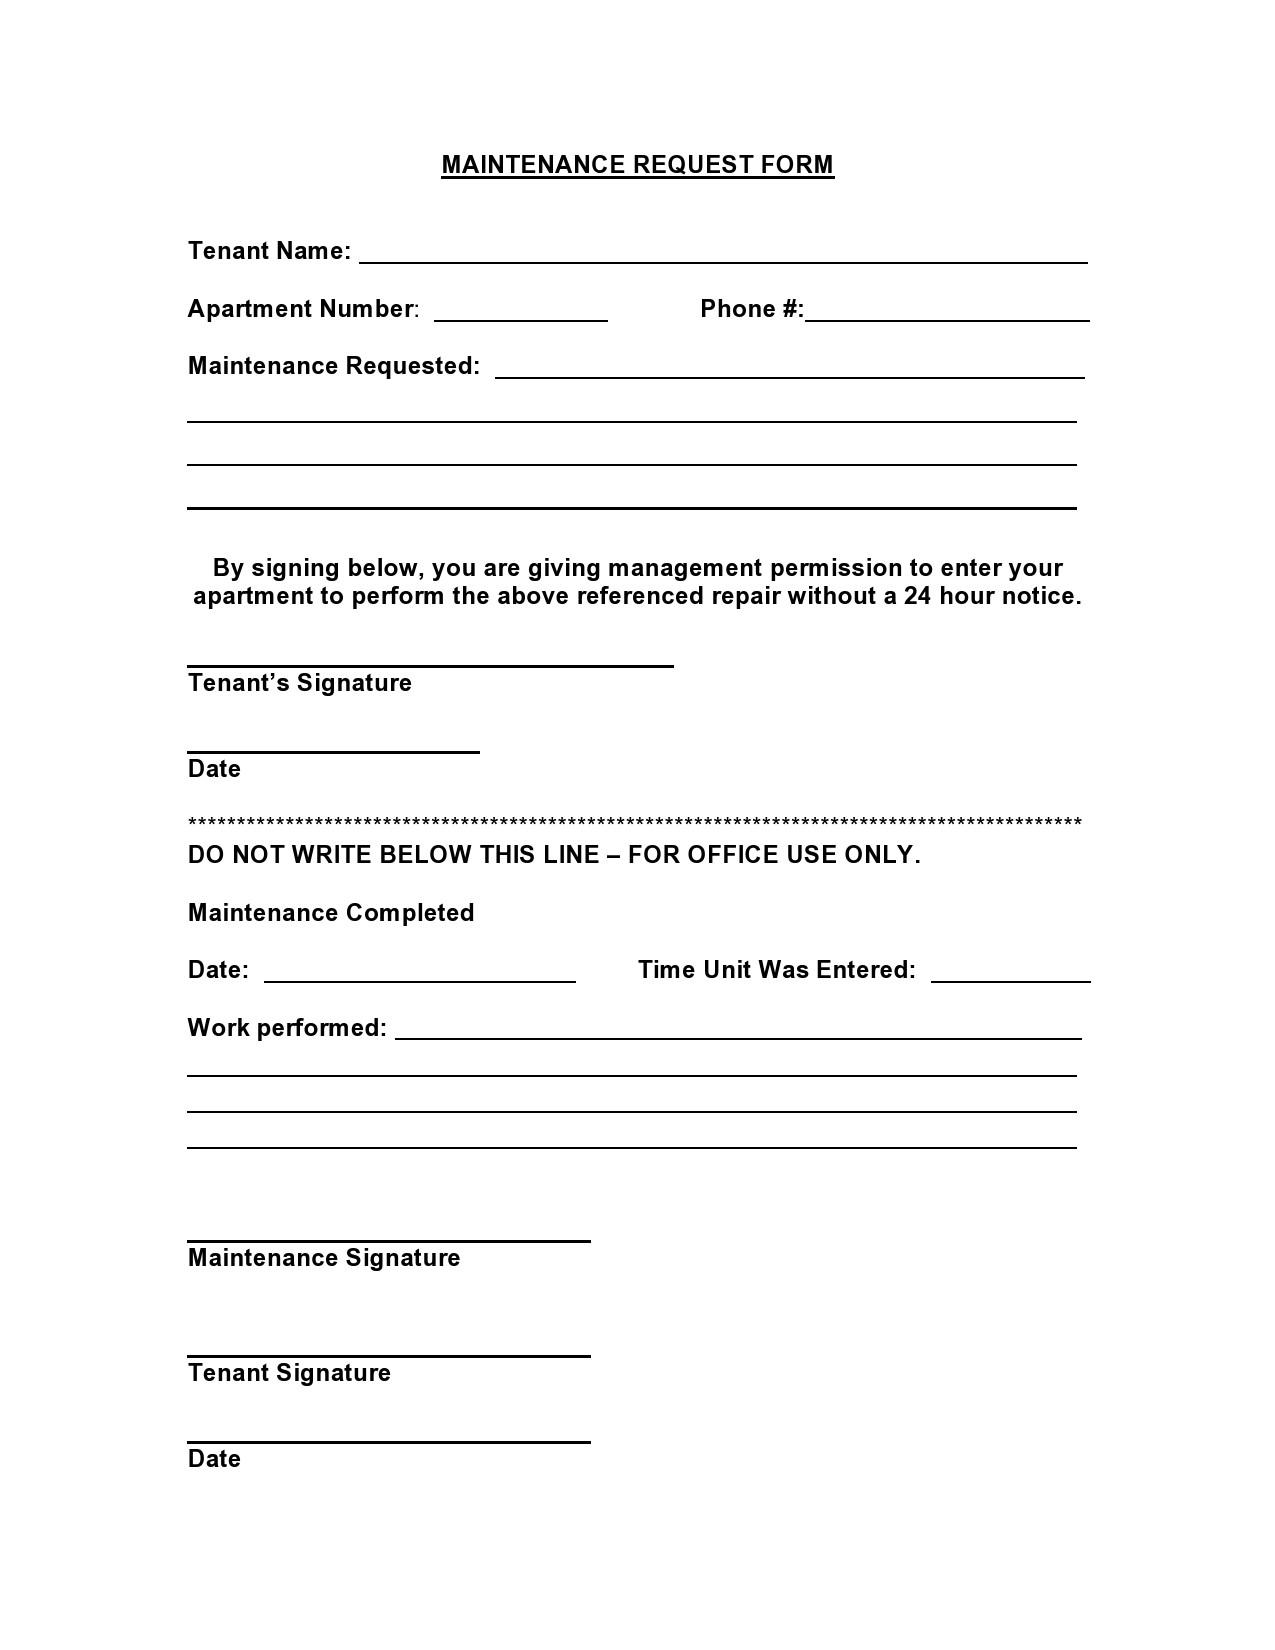 54 Maintenance Request Form Templates Free Templatelab